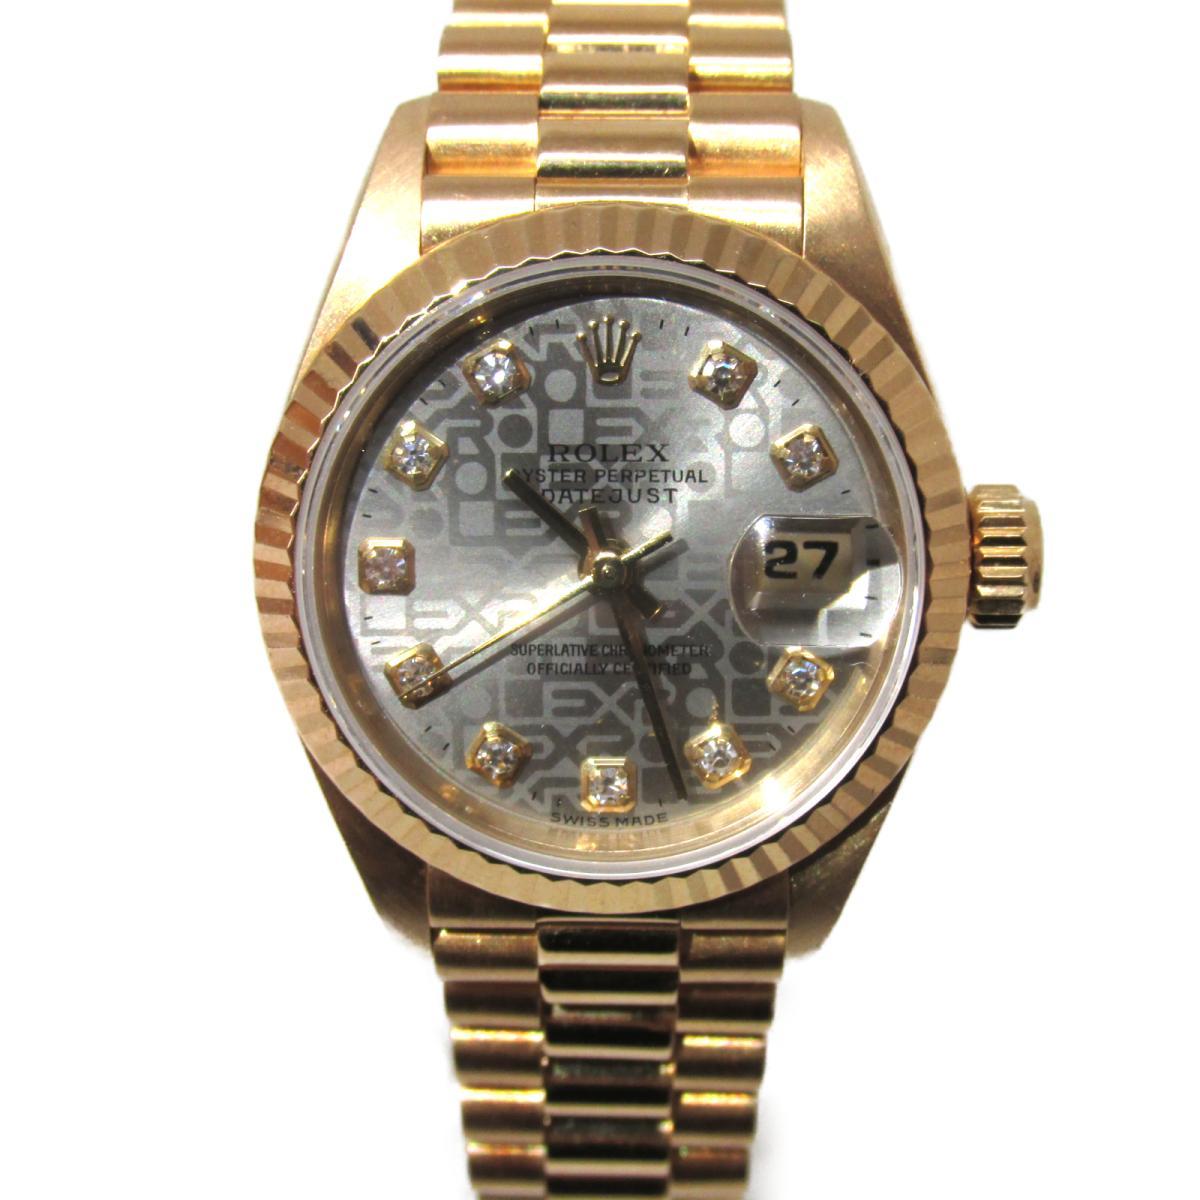 ROLEX 時計 69178G デイトジャスト 腕時計/レディース/SALE/お買得品